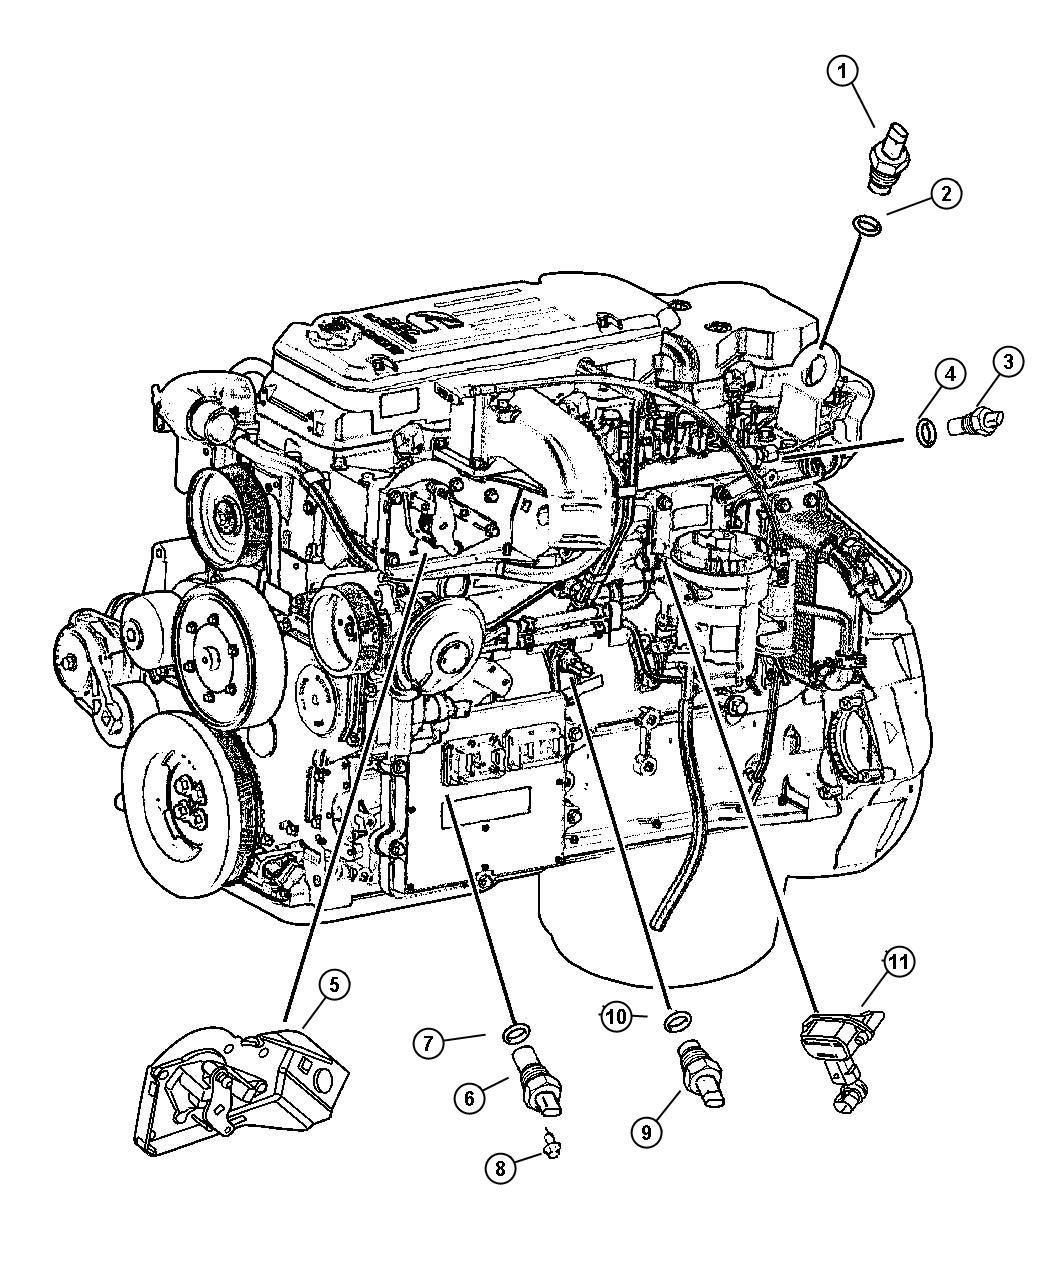 Dodge Ram Sensor Crankshaft Federal Emissions